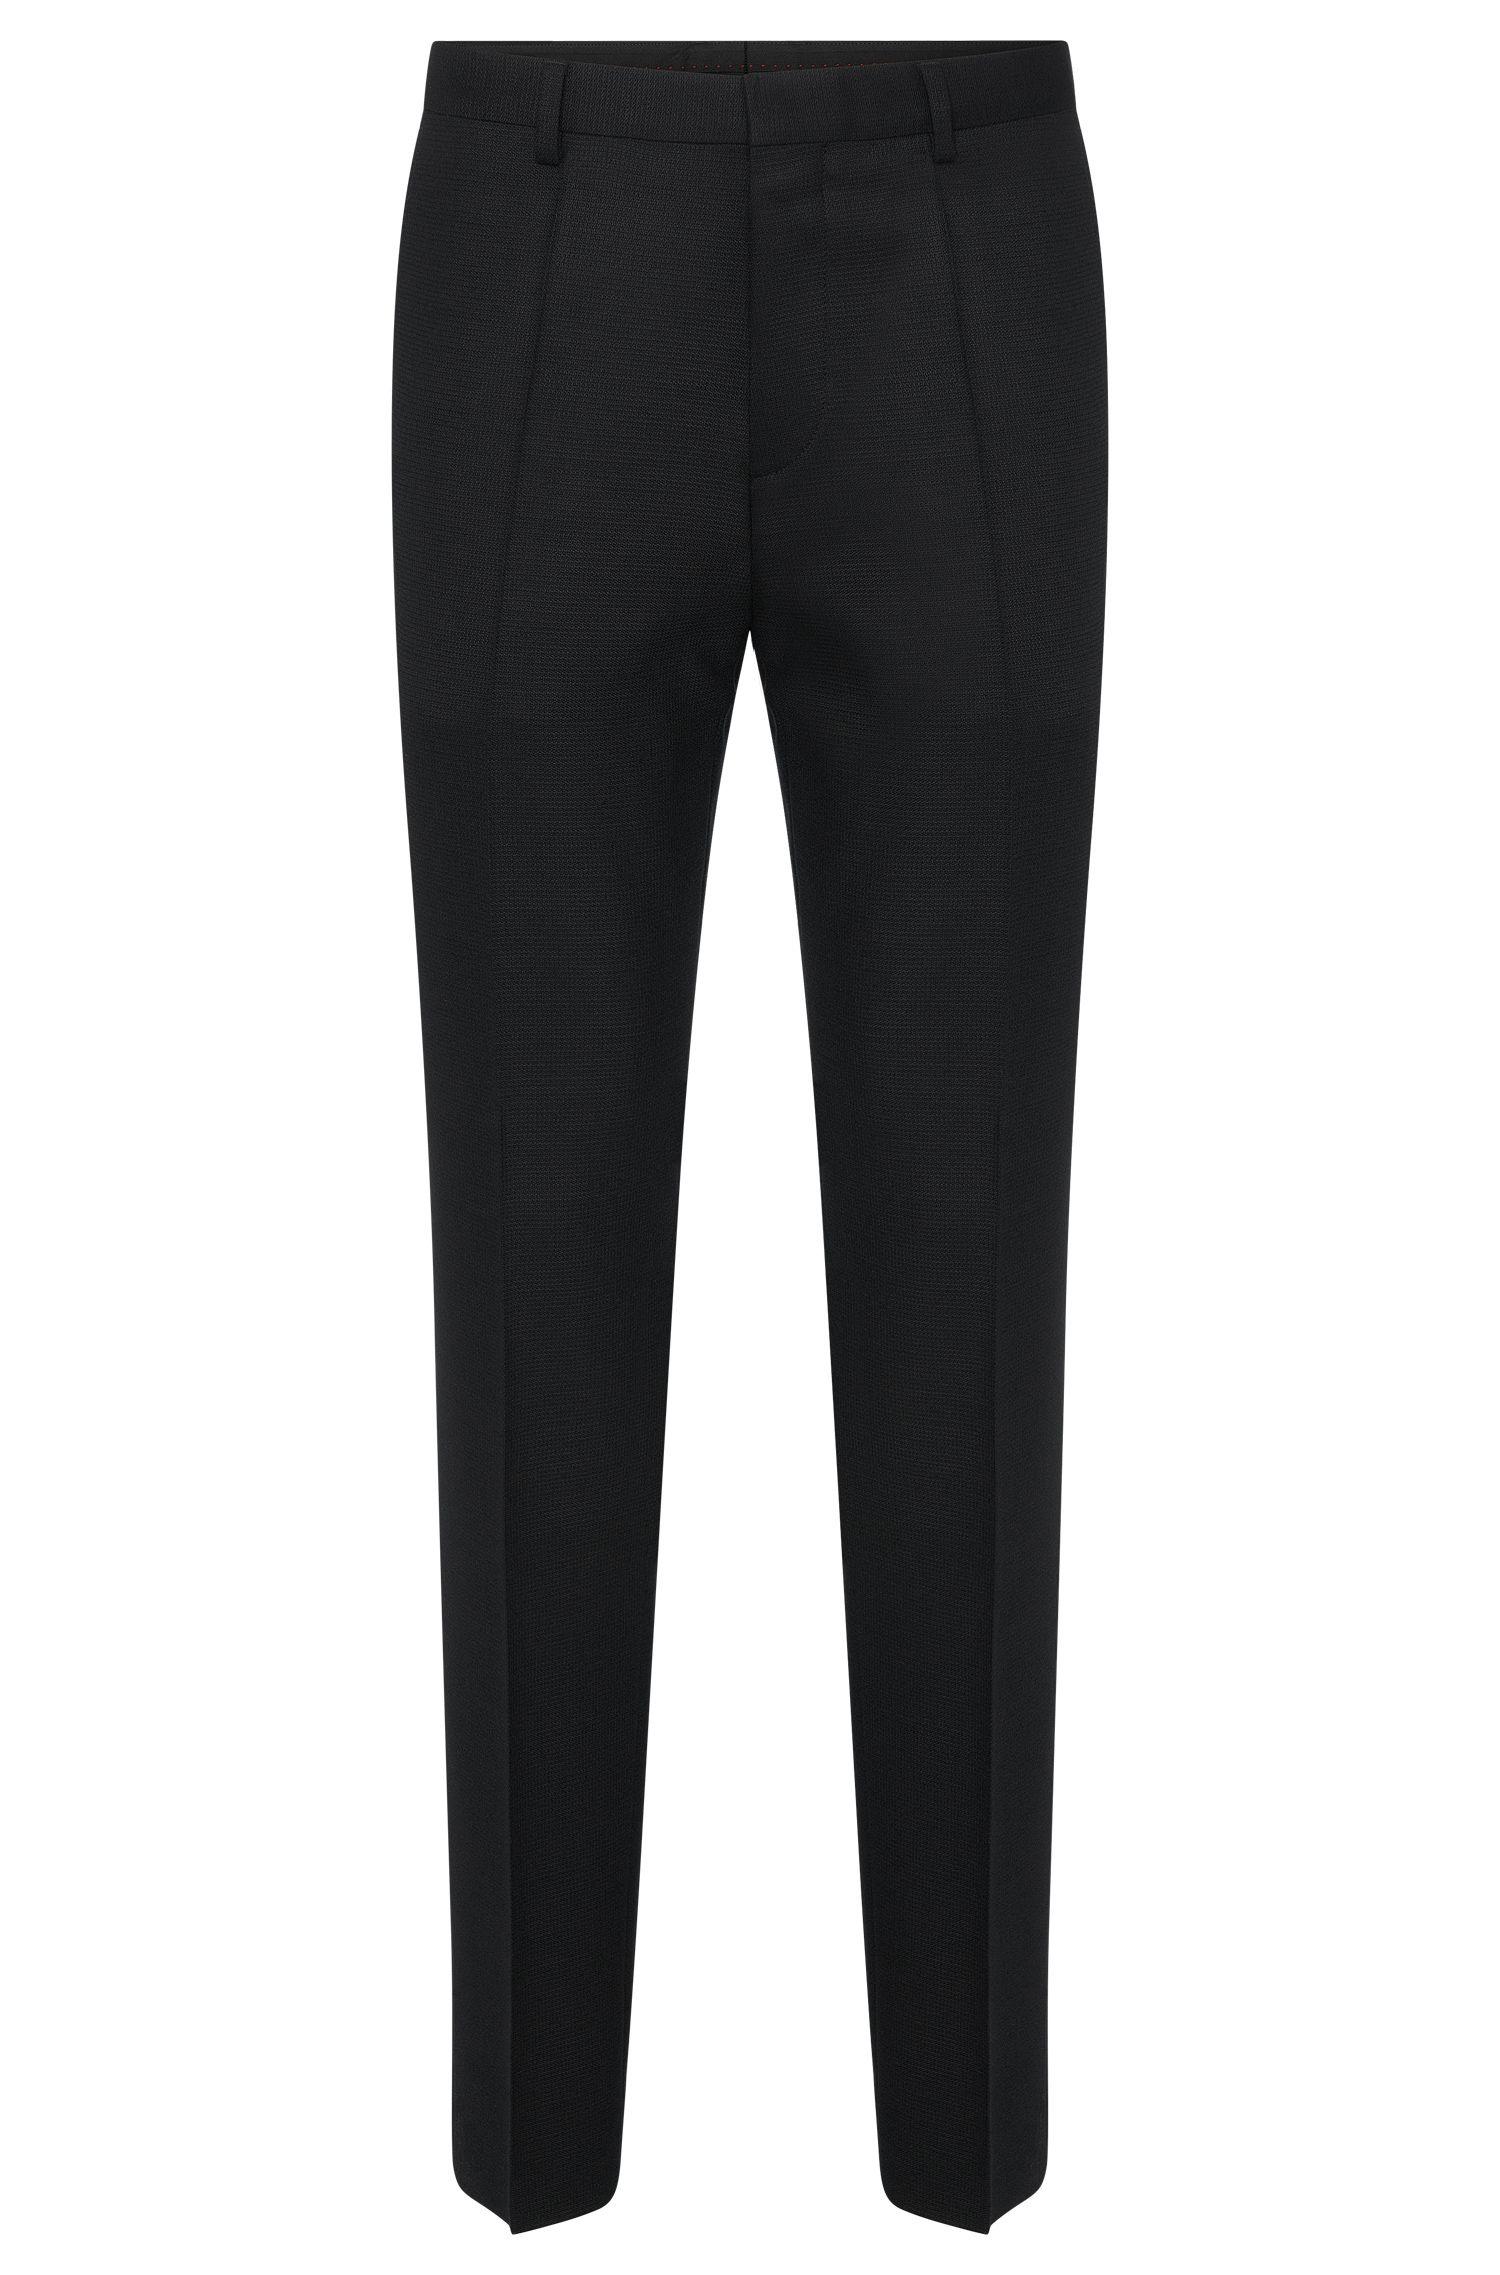 'Hets' | Slim Fit, Stretch Virgin Wool Blend Patterned Dress Pants